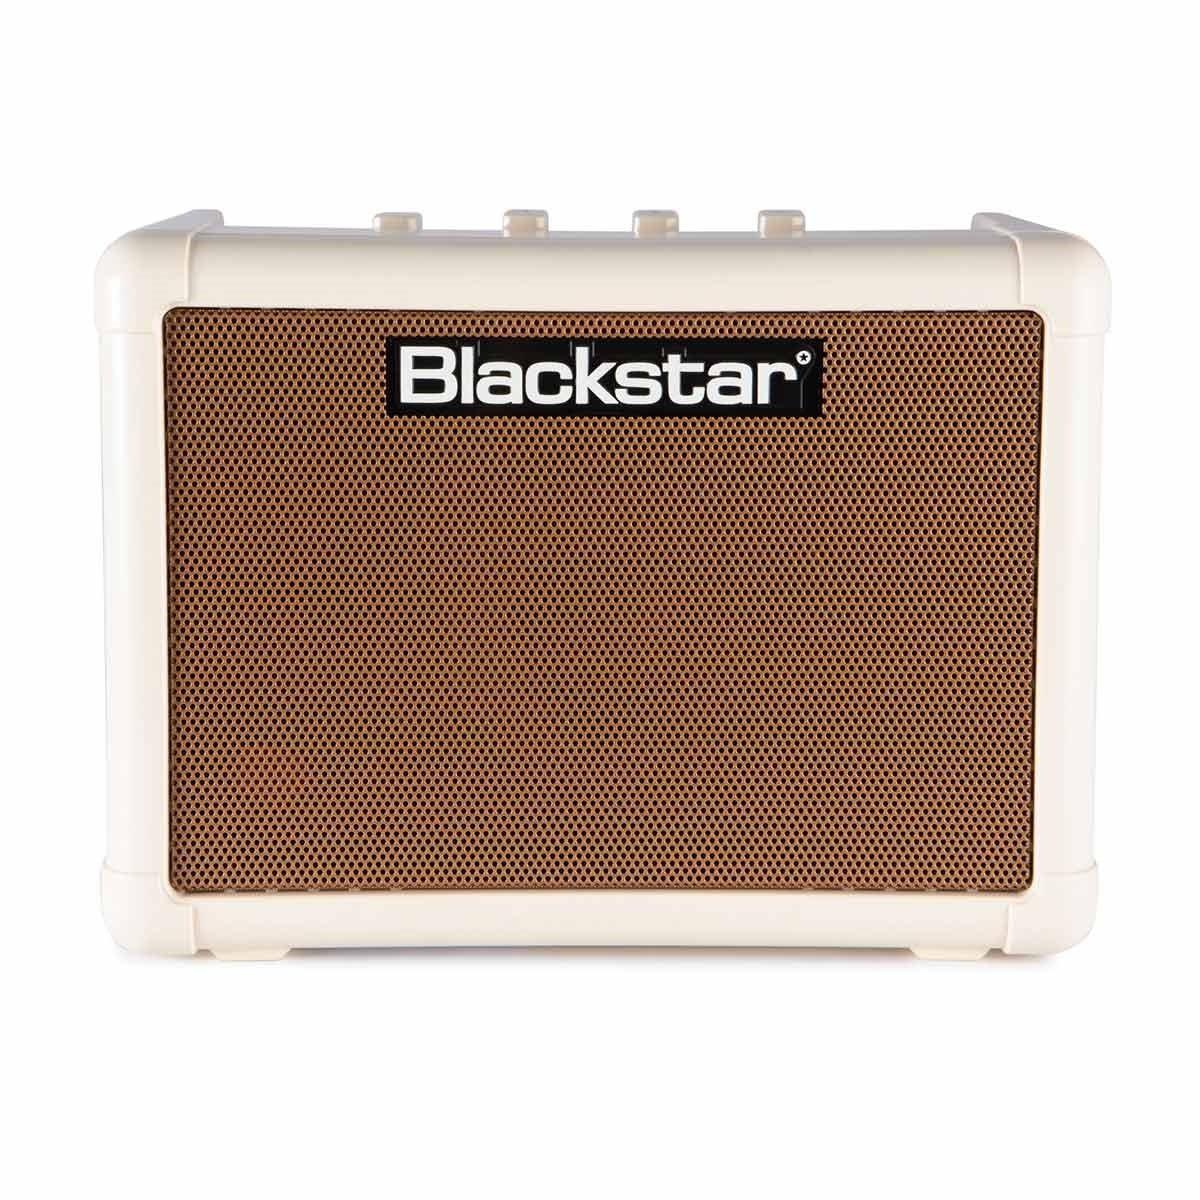 Blackstar Fly 3 Acoustic Mini Amp